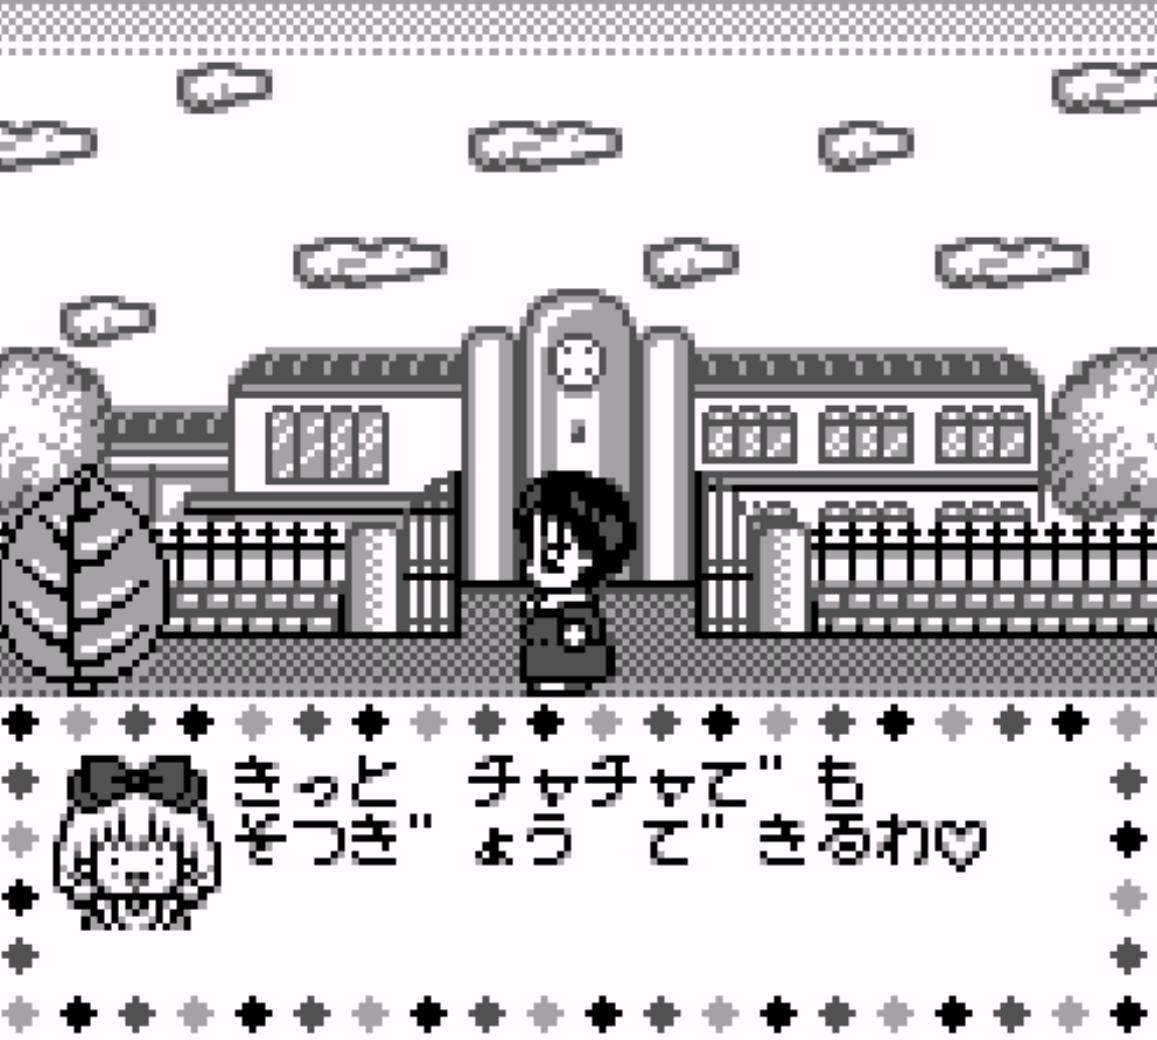 Akazukin Chacha (Game Boy)